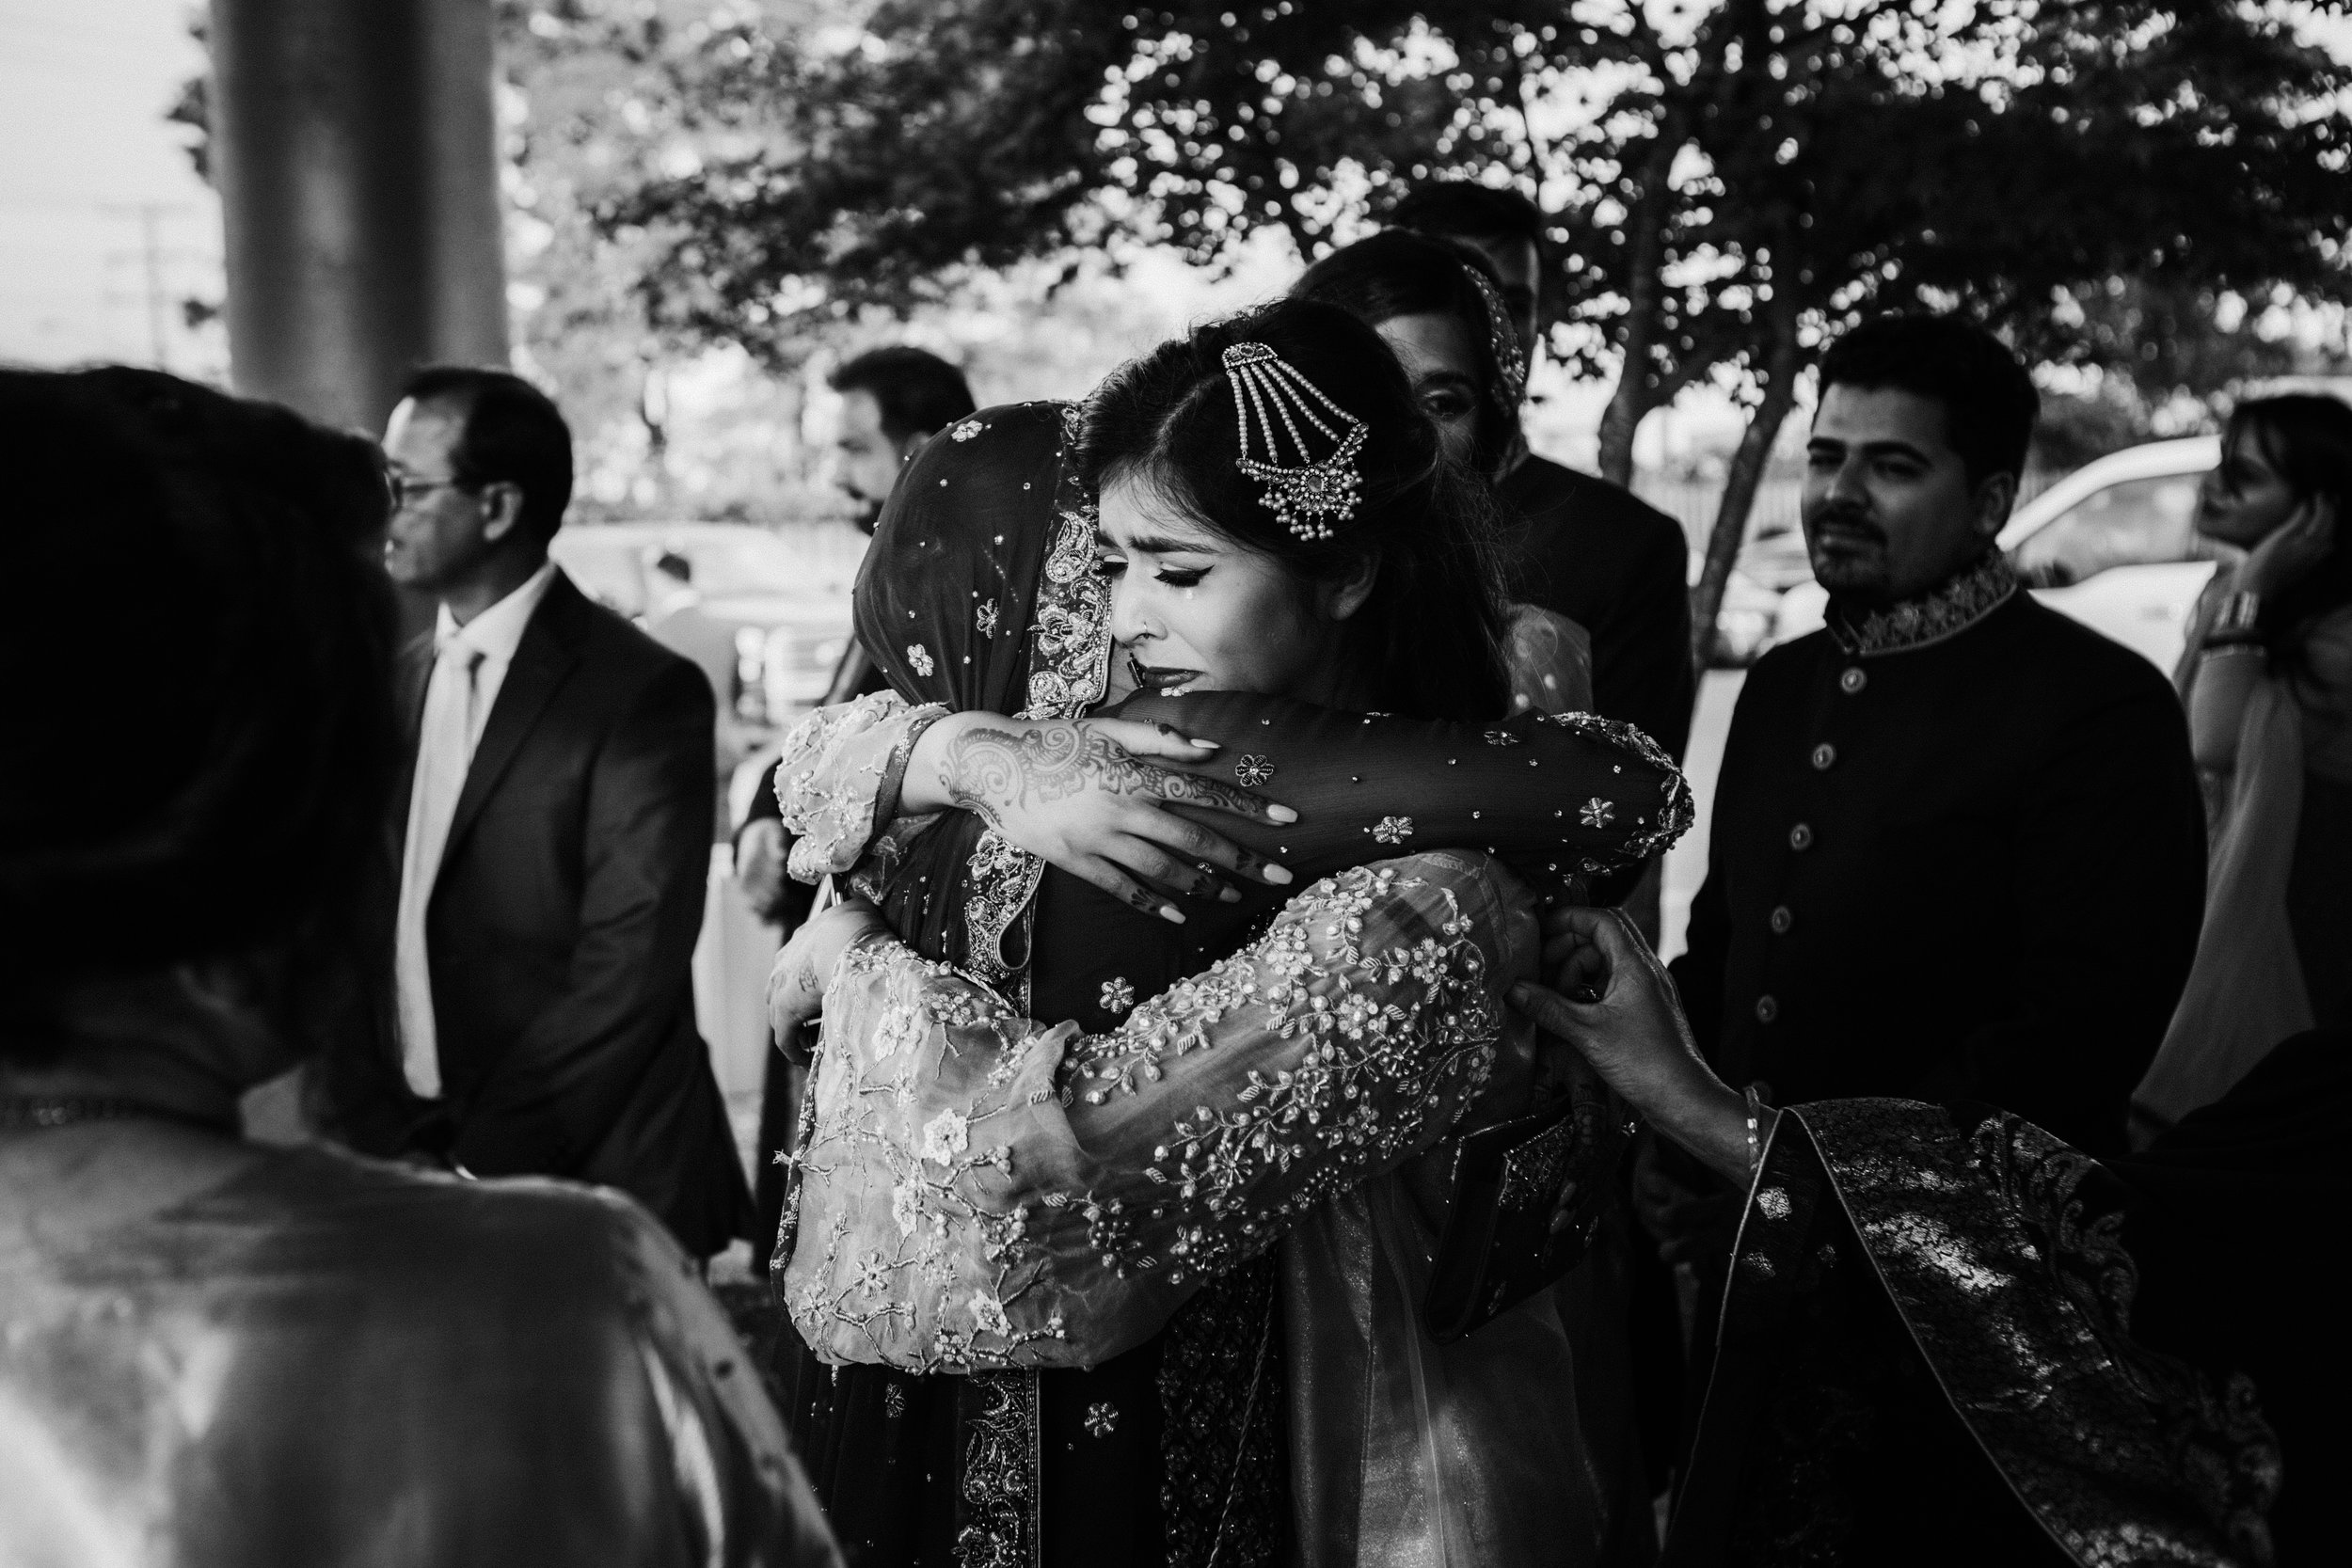 pakistani-vancouver-surrey-wedding-photographer-02.jpg